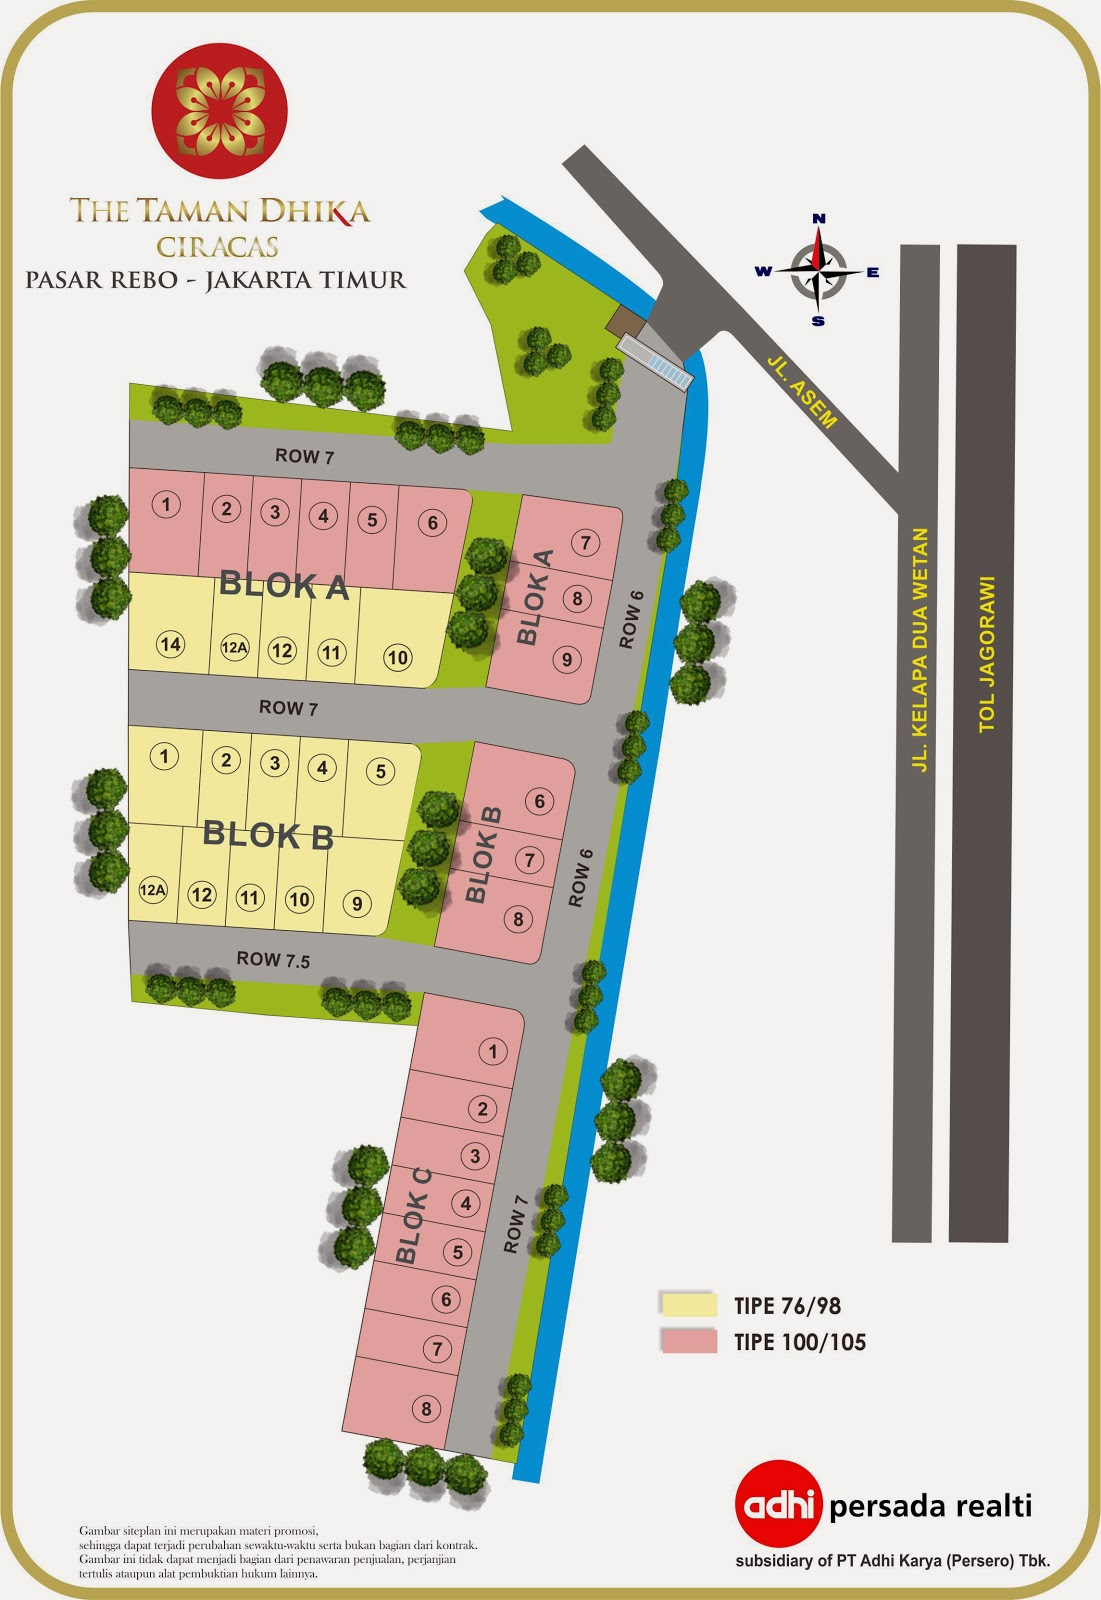 Site Plan ~ THE TAMAN DHIKA CIRACAS JAKARTA TIMUR